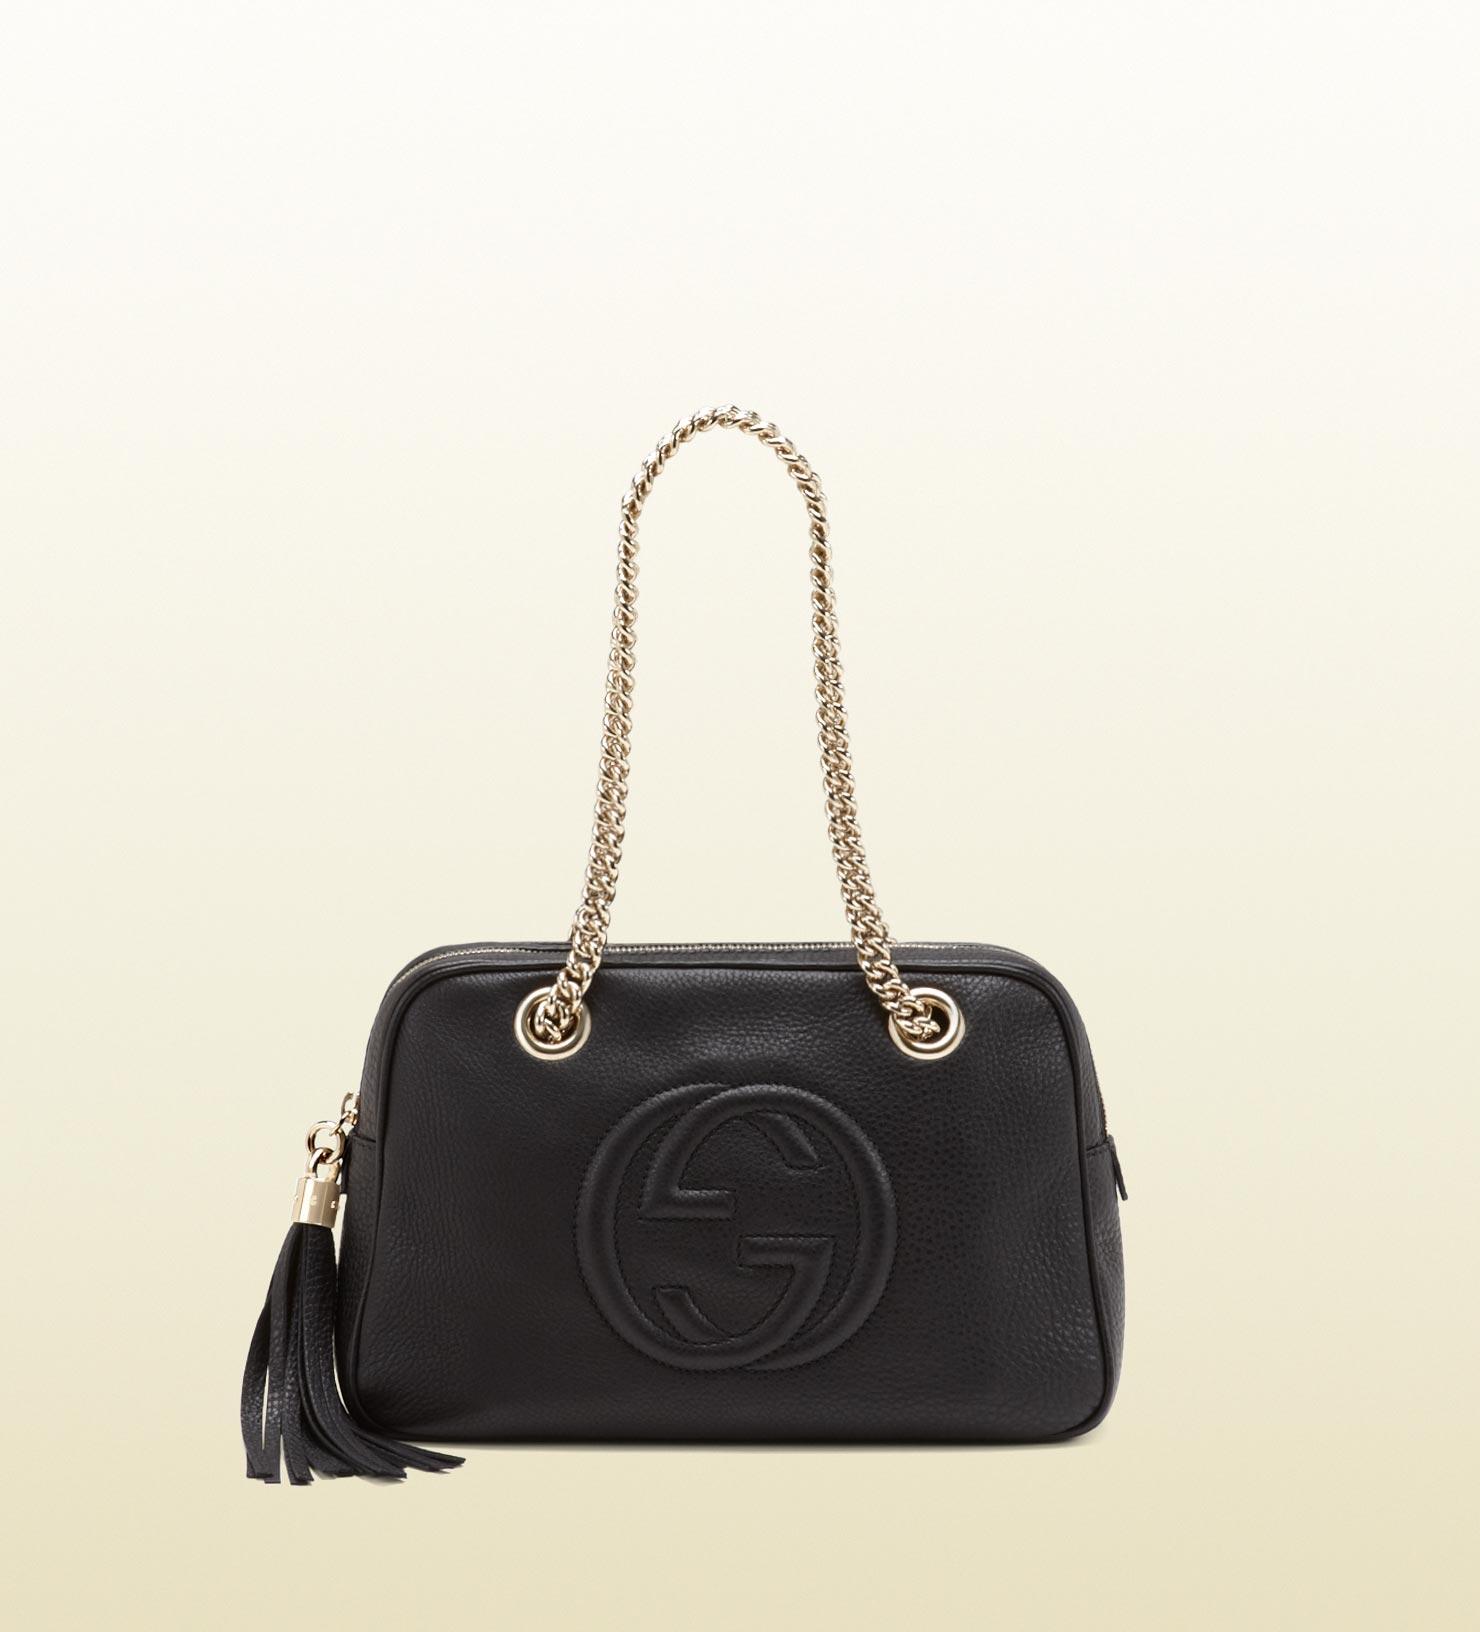 400308fa3 Gucci Soho Leather Shoulder Bag in Black - Lyst